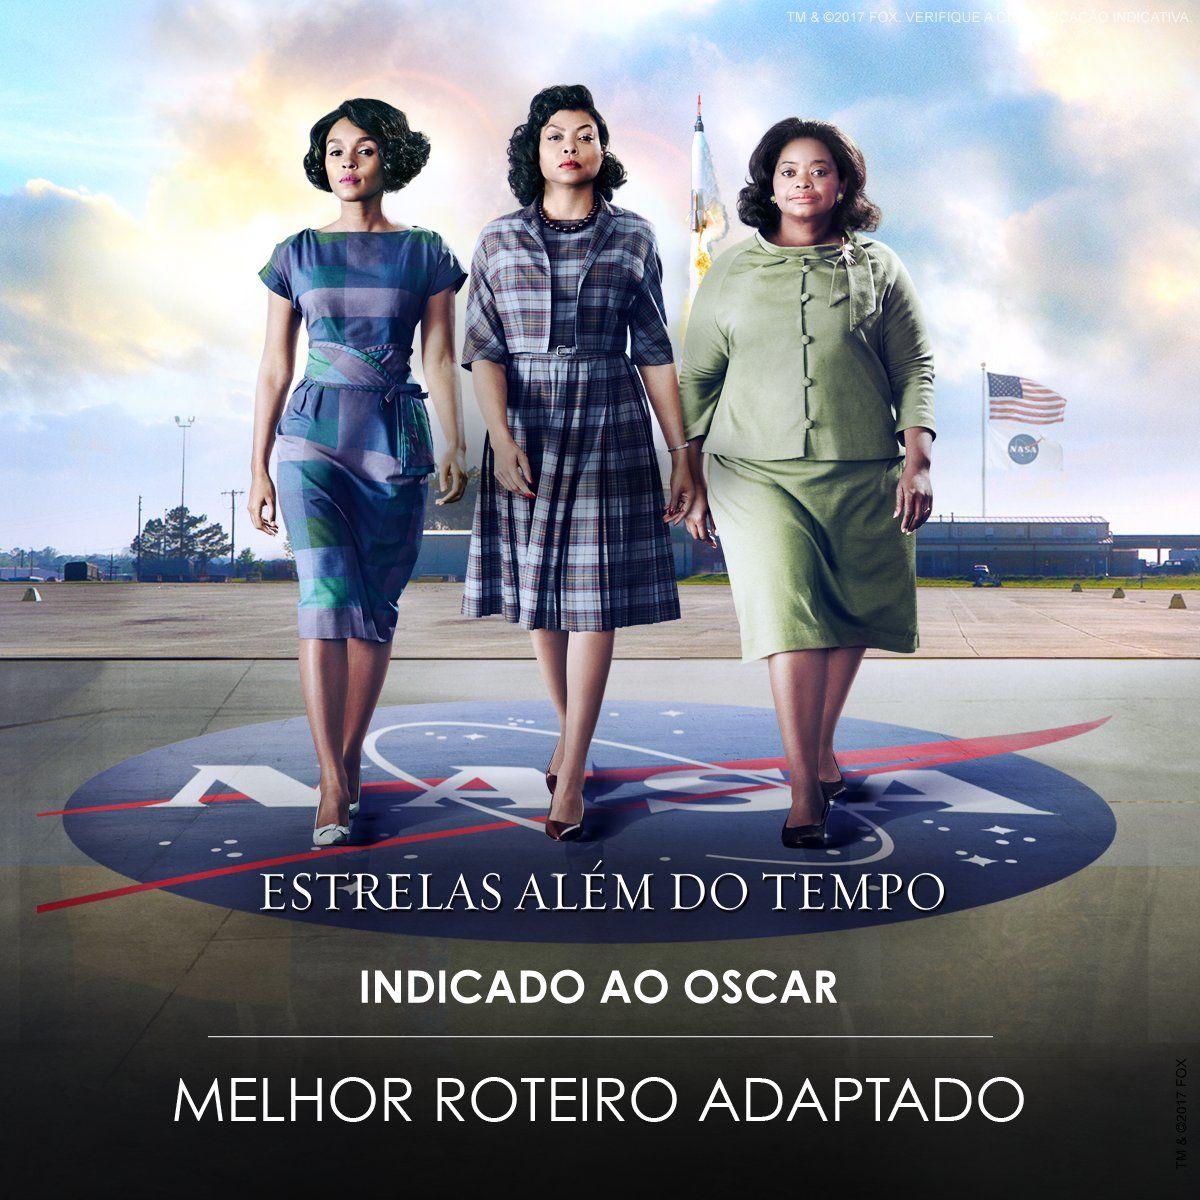 Fox Film do Brasil (@FoxFilmdoBrasil) | Twitter